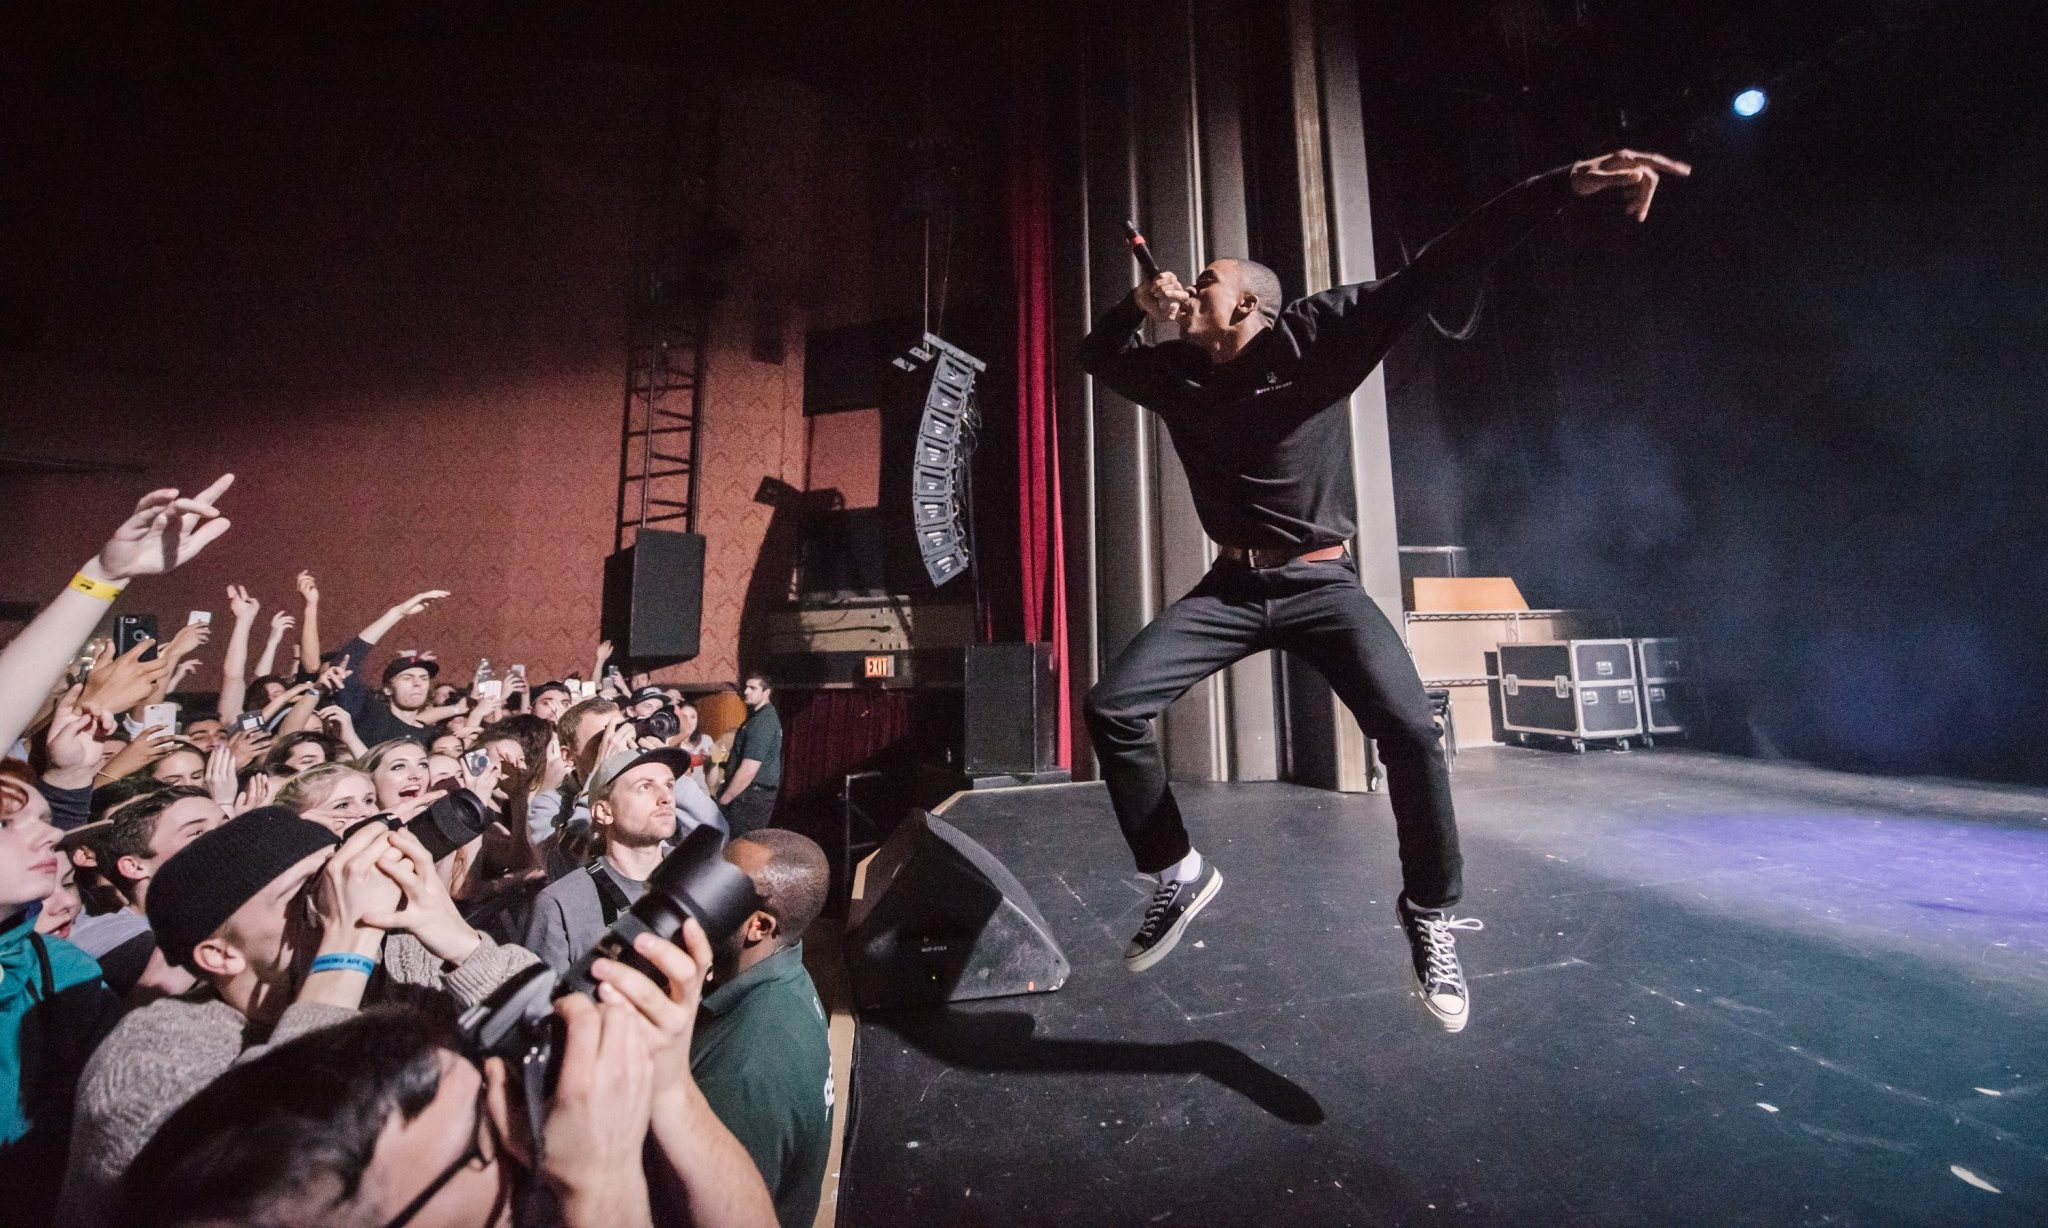 Vince Staples 2017 Vancouver concert at the Vogue Theatre